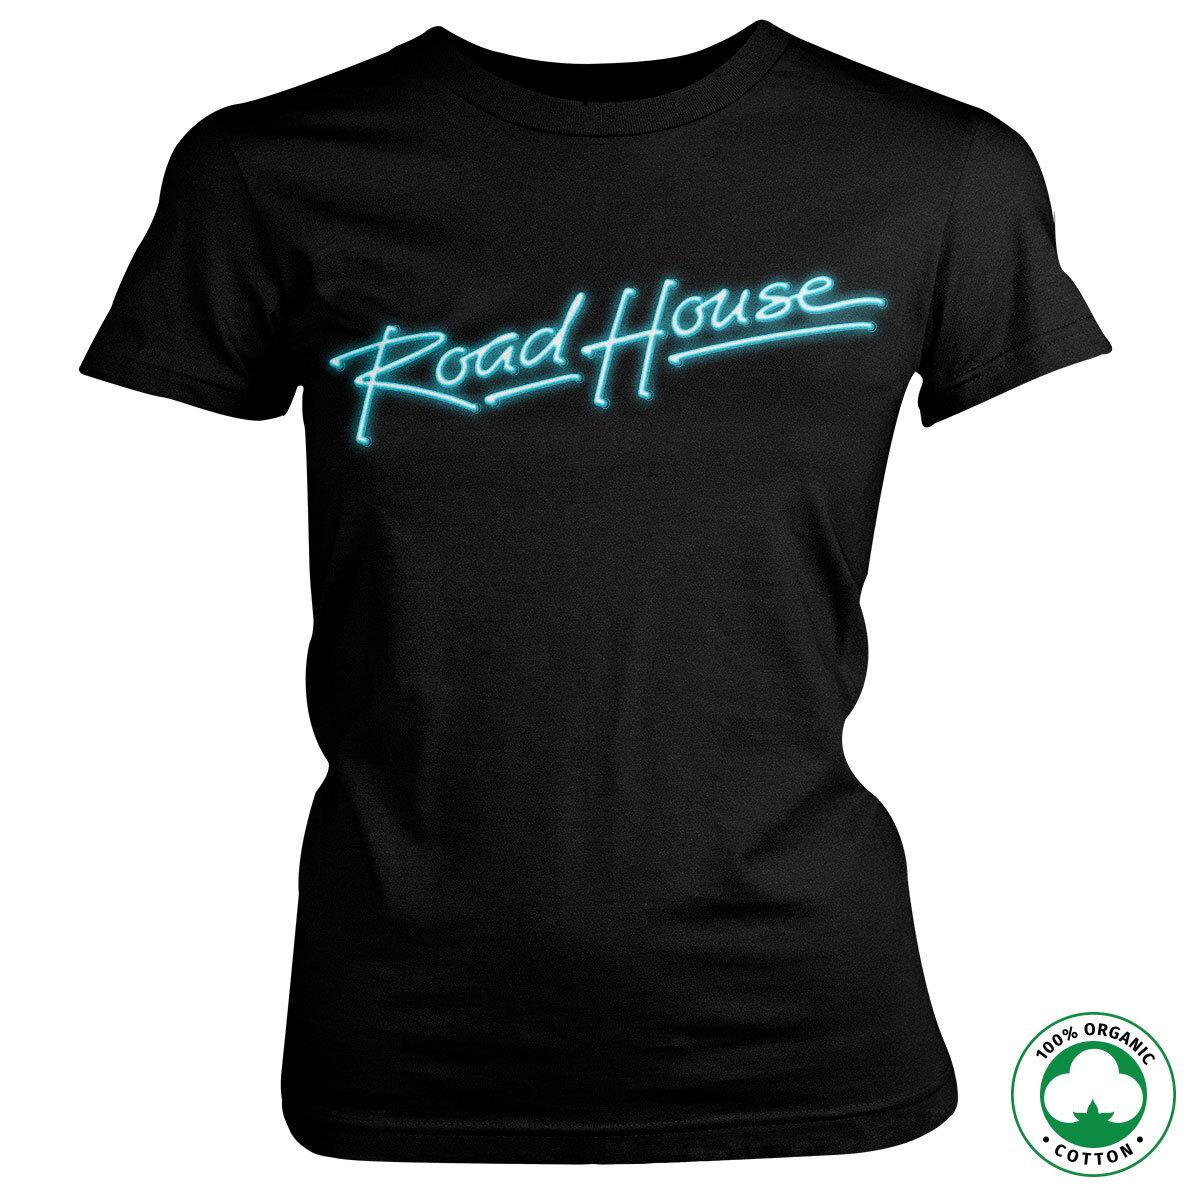 Road House Logo Organic Girly Tee